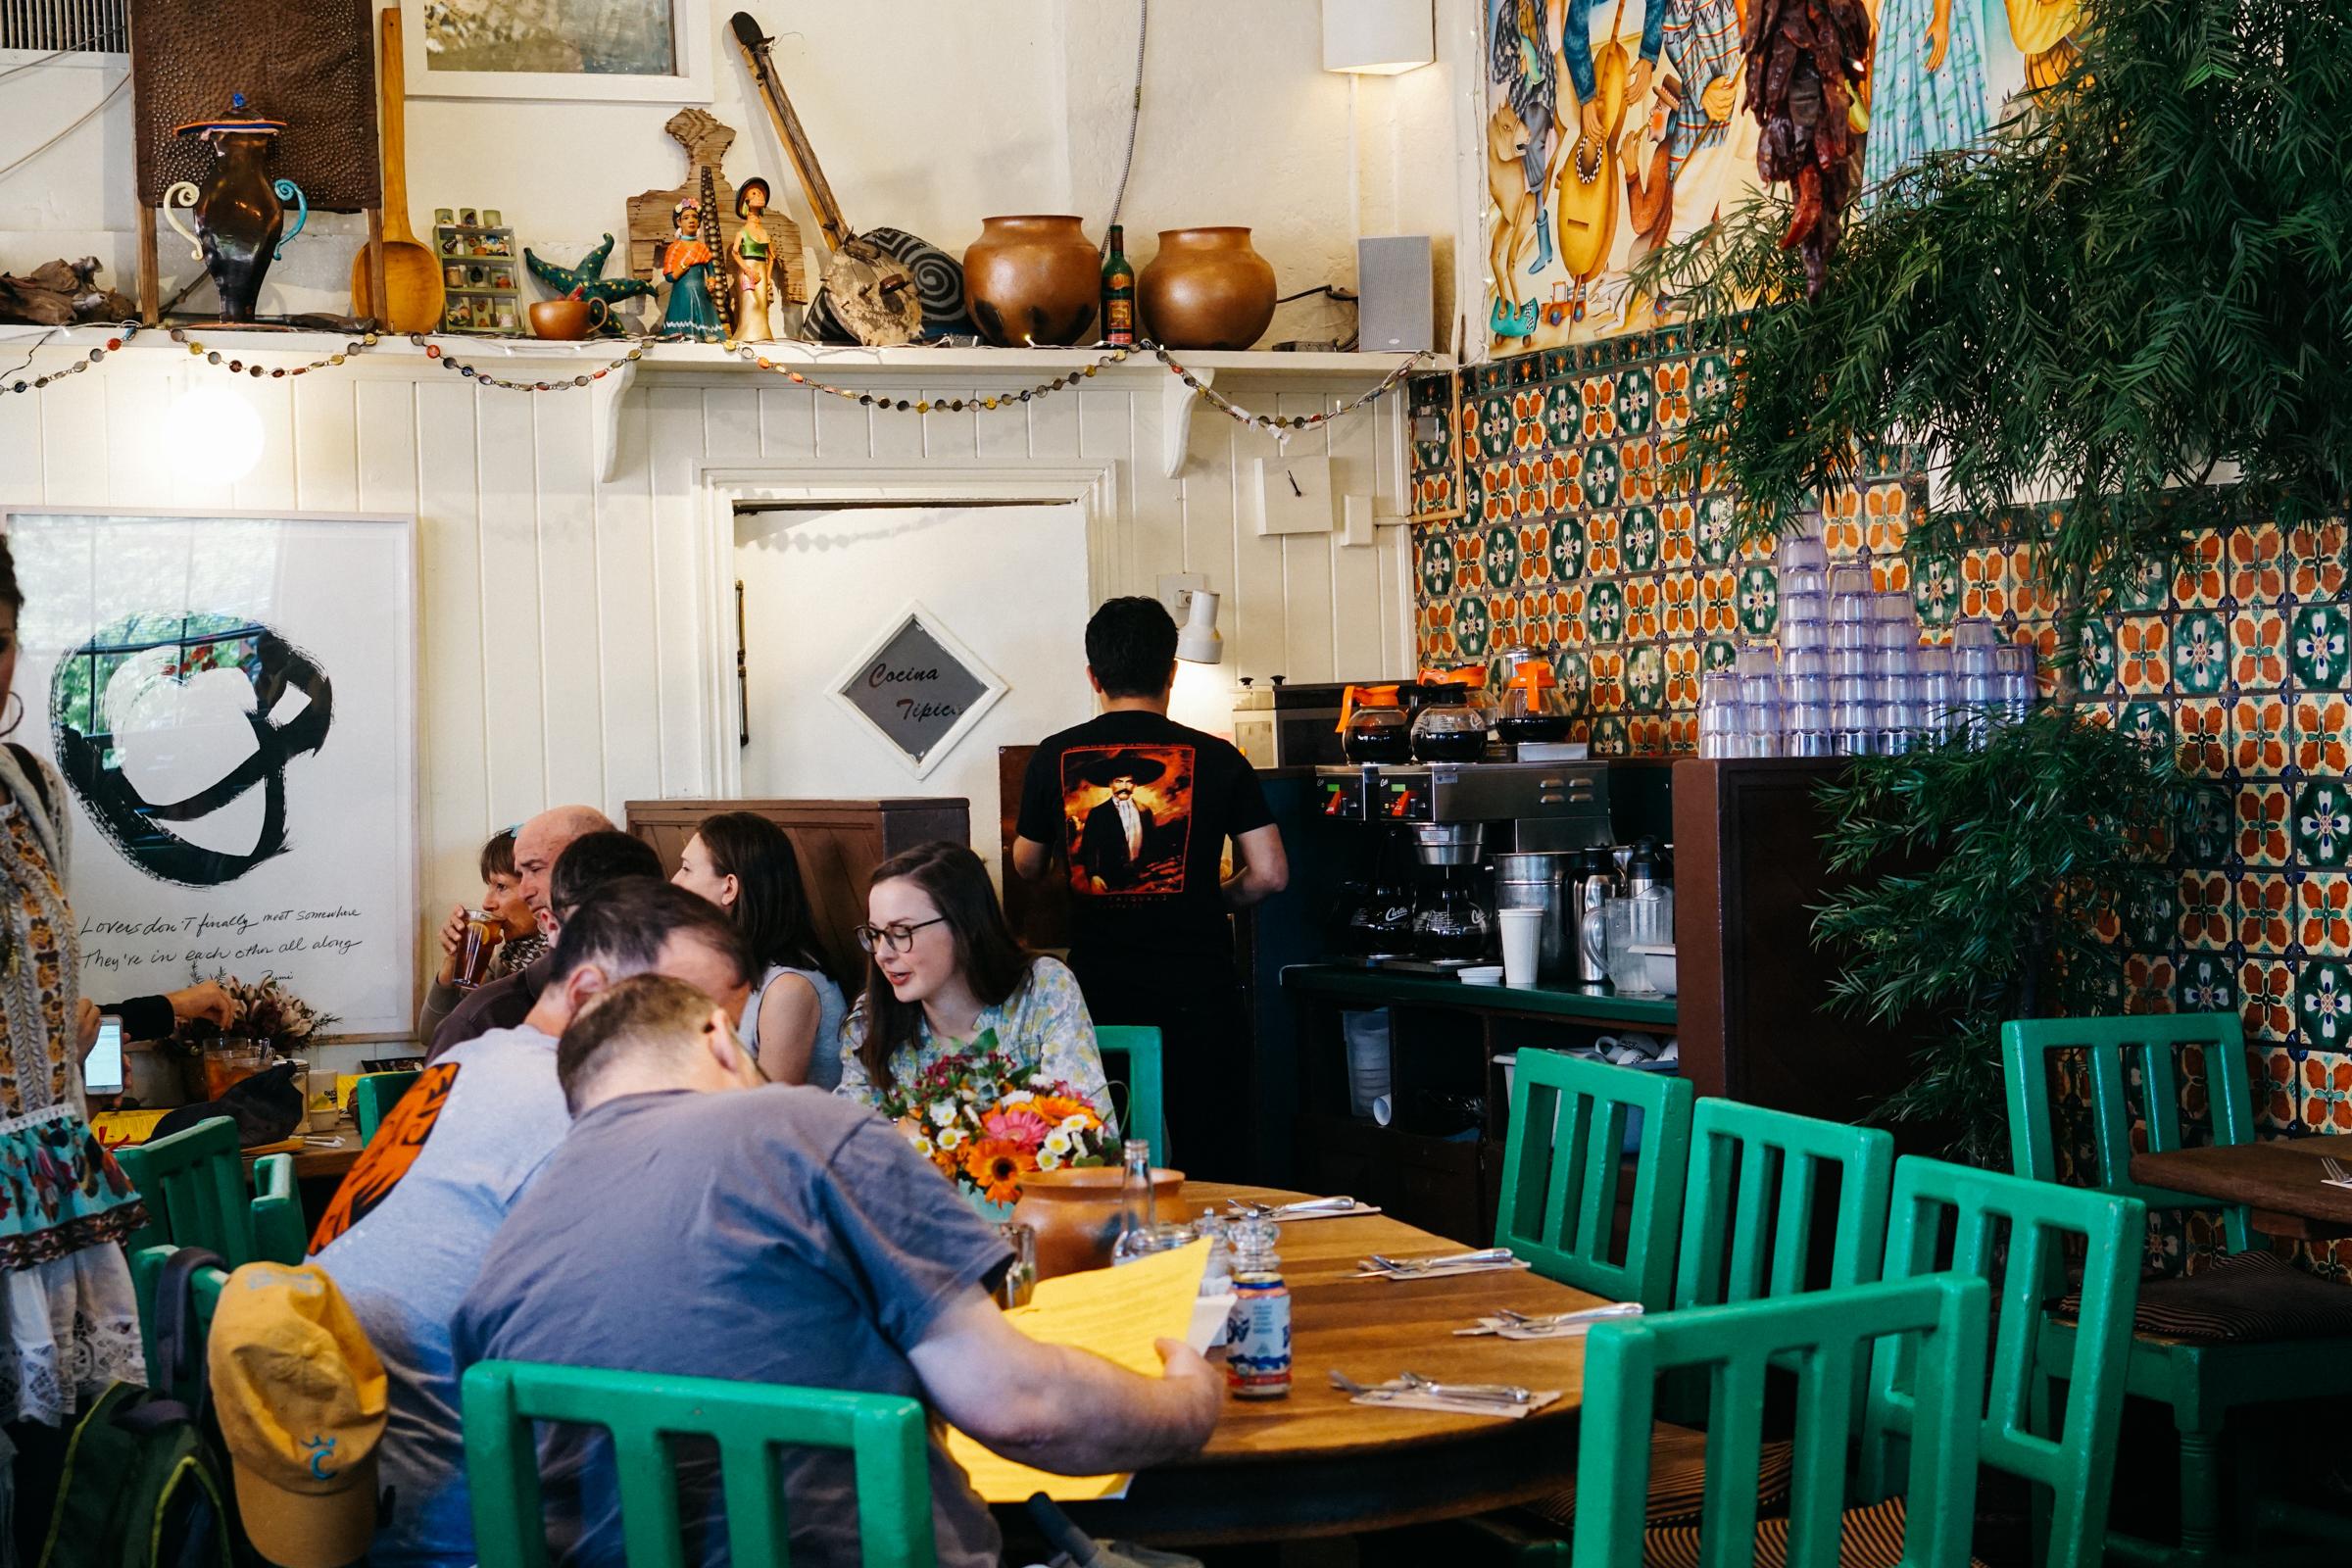 Best Restaurants in Santa Fe